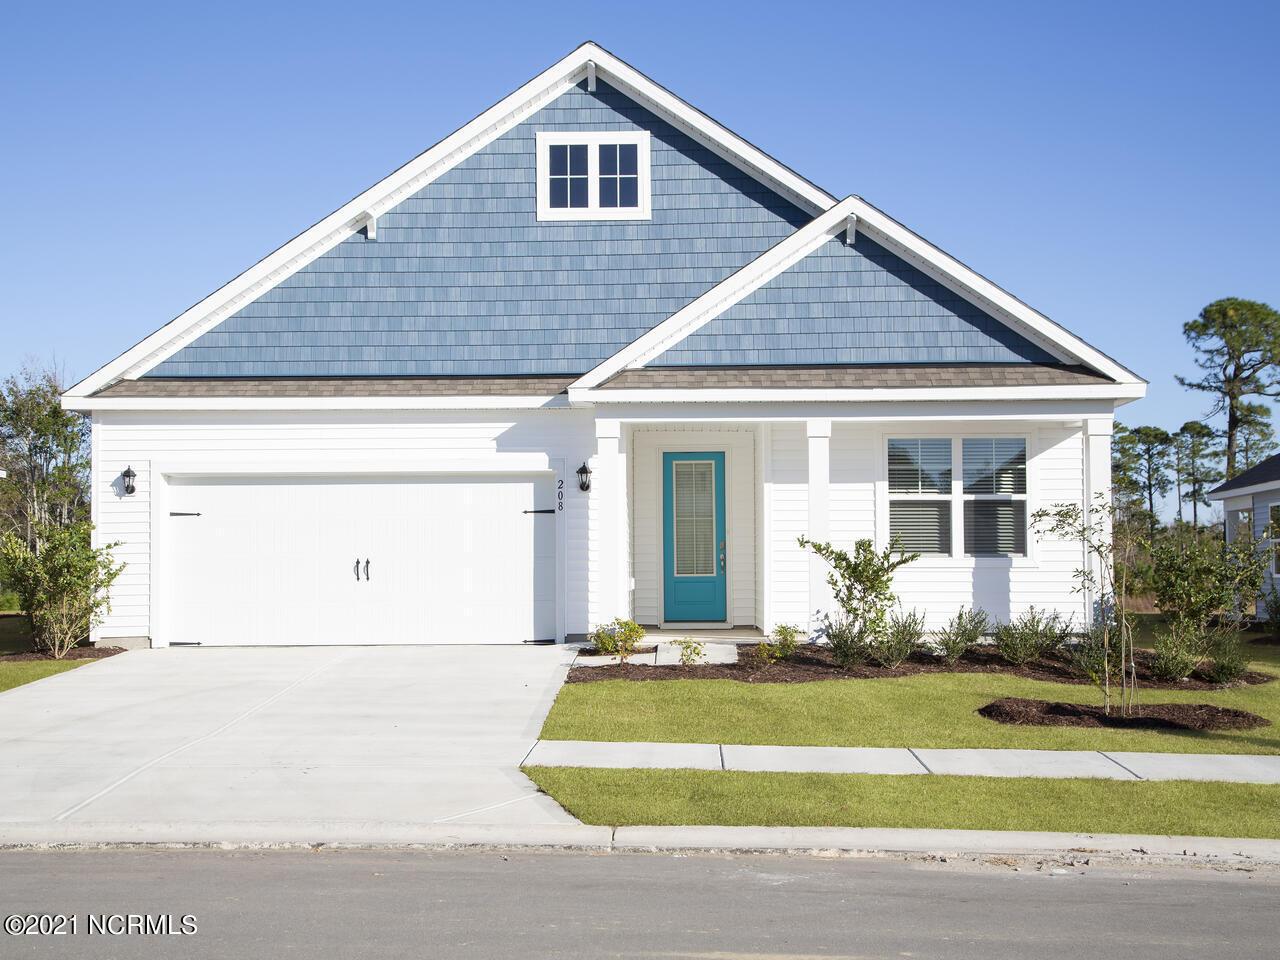 2824 Hatchers Run, Leland, North Carolina 28451, 3 Bedrooms Bedrooms, 6 Rooms Rooms,2 BathroomsBathrooms,Single family residence,For sale,Hatchers,100285240